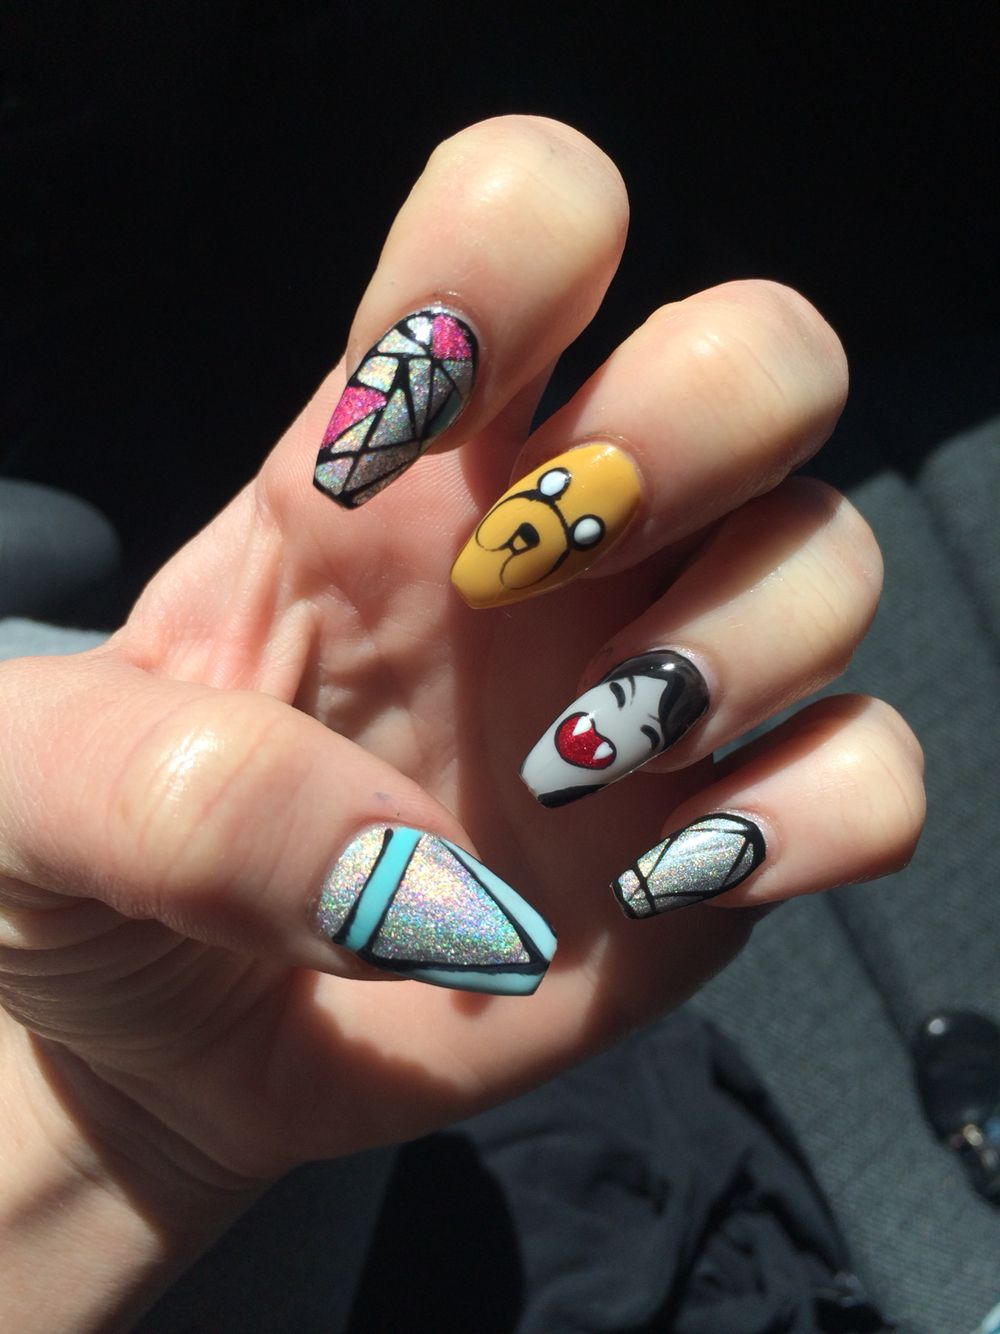 Adventure Time Nails Hellokaylaranaenails Hkrn Nailenthusiast Genuineswarovski Lasvegasnails Lvnails Dopenail Adventure Time Nails Las Vegas Nails Nails